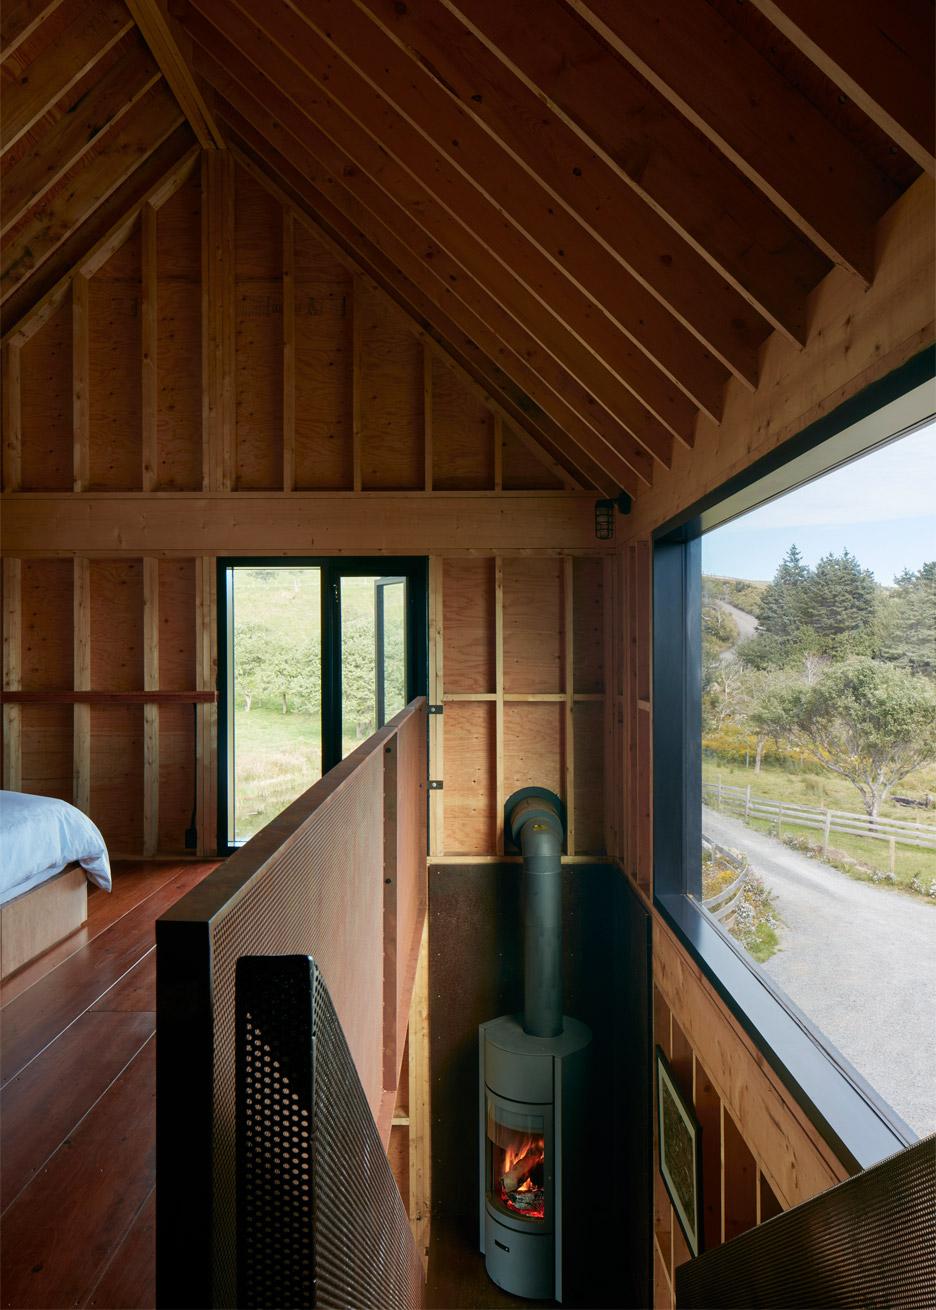 Enough house weathering steel cabin in Nova Scotia by Brian Mackay Lyons